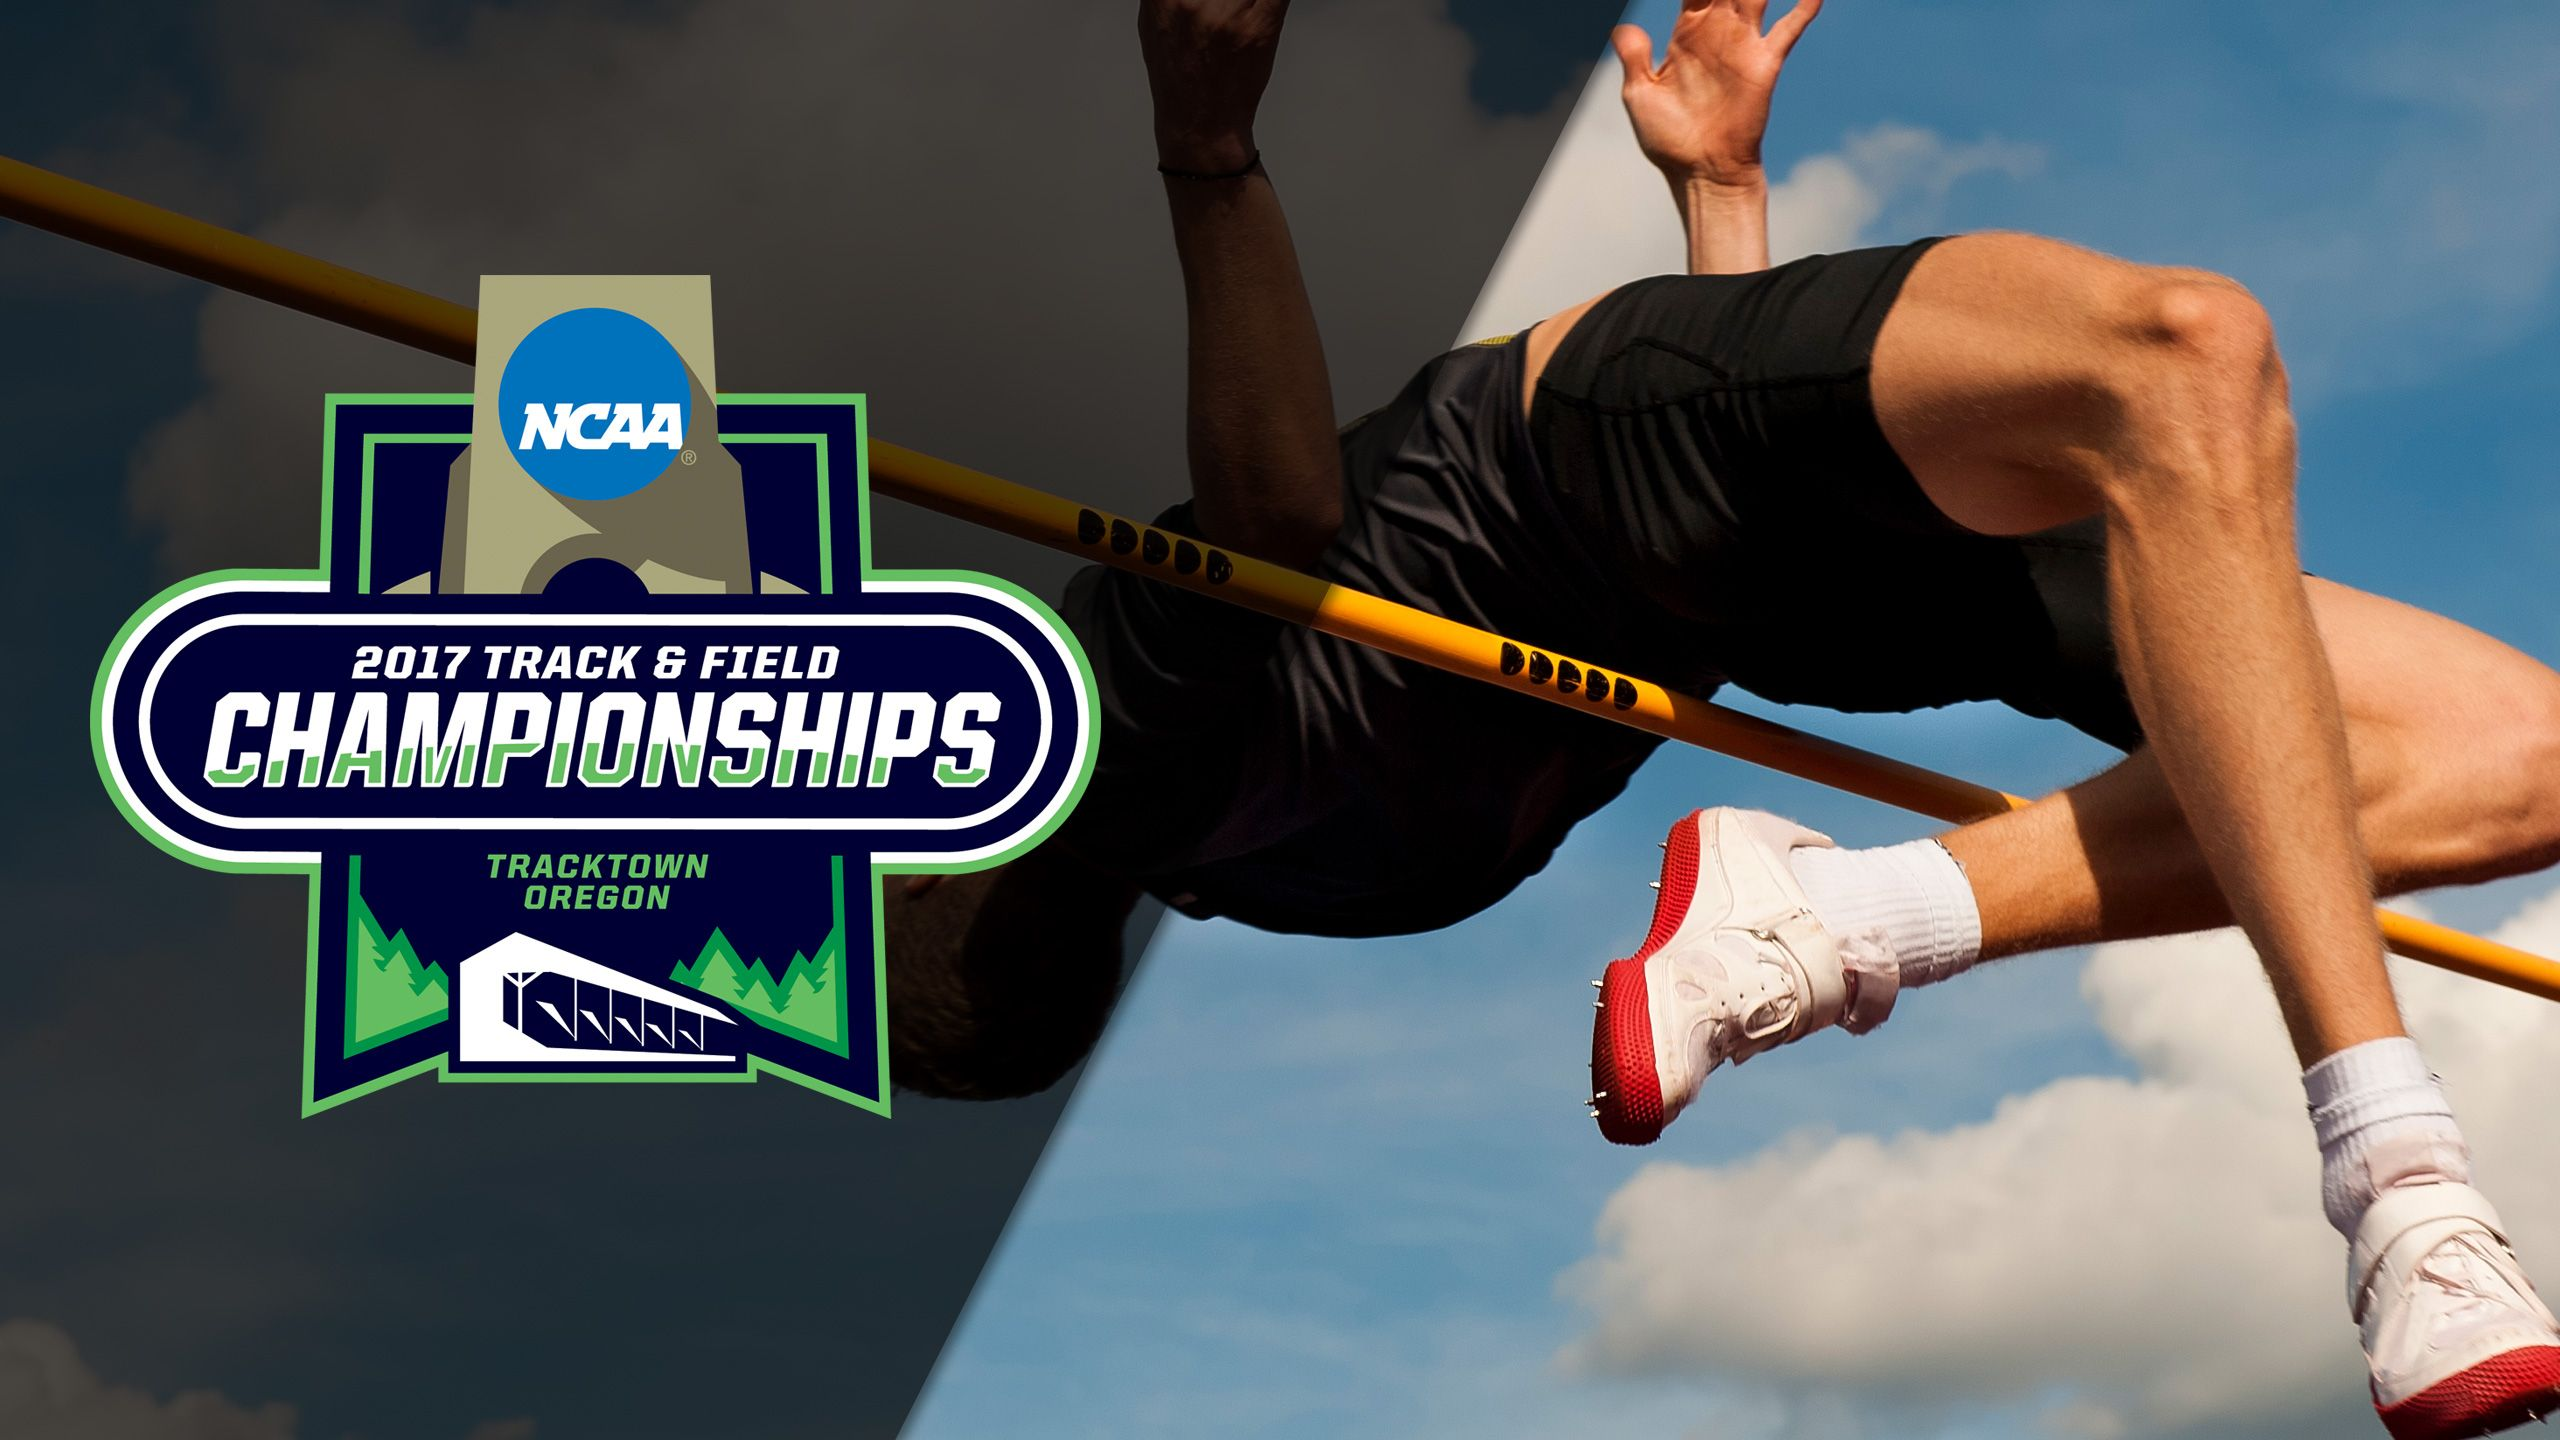 NCAA Track & Field Outdoor Championships - Men's High Jump Final